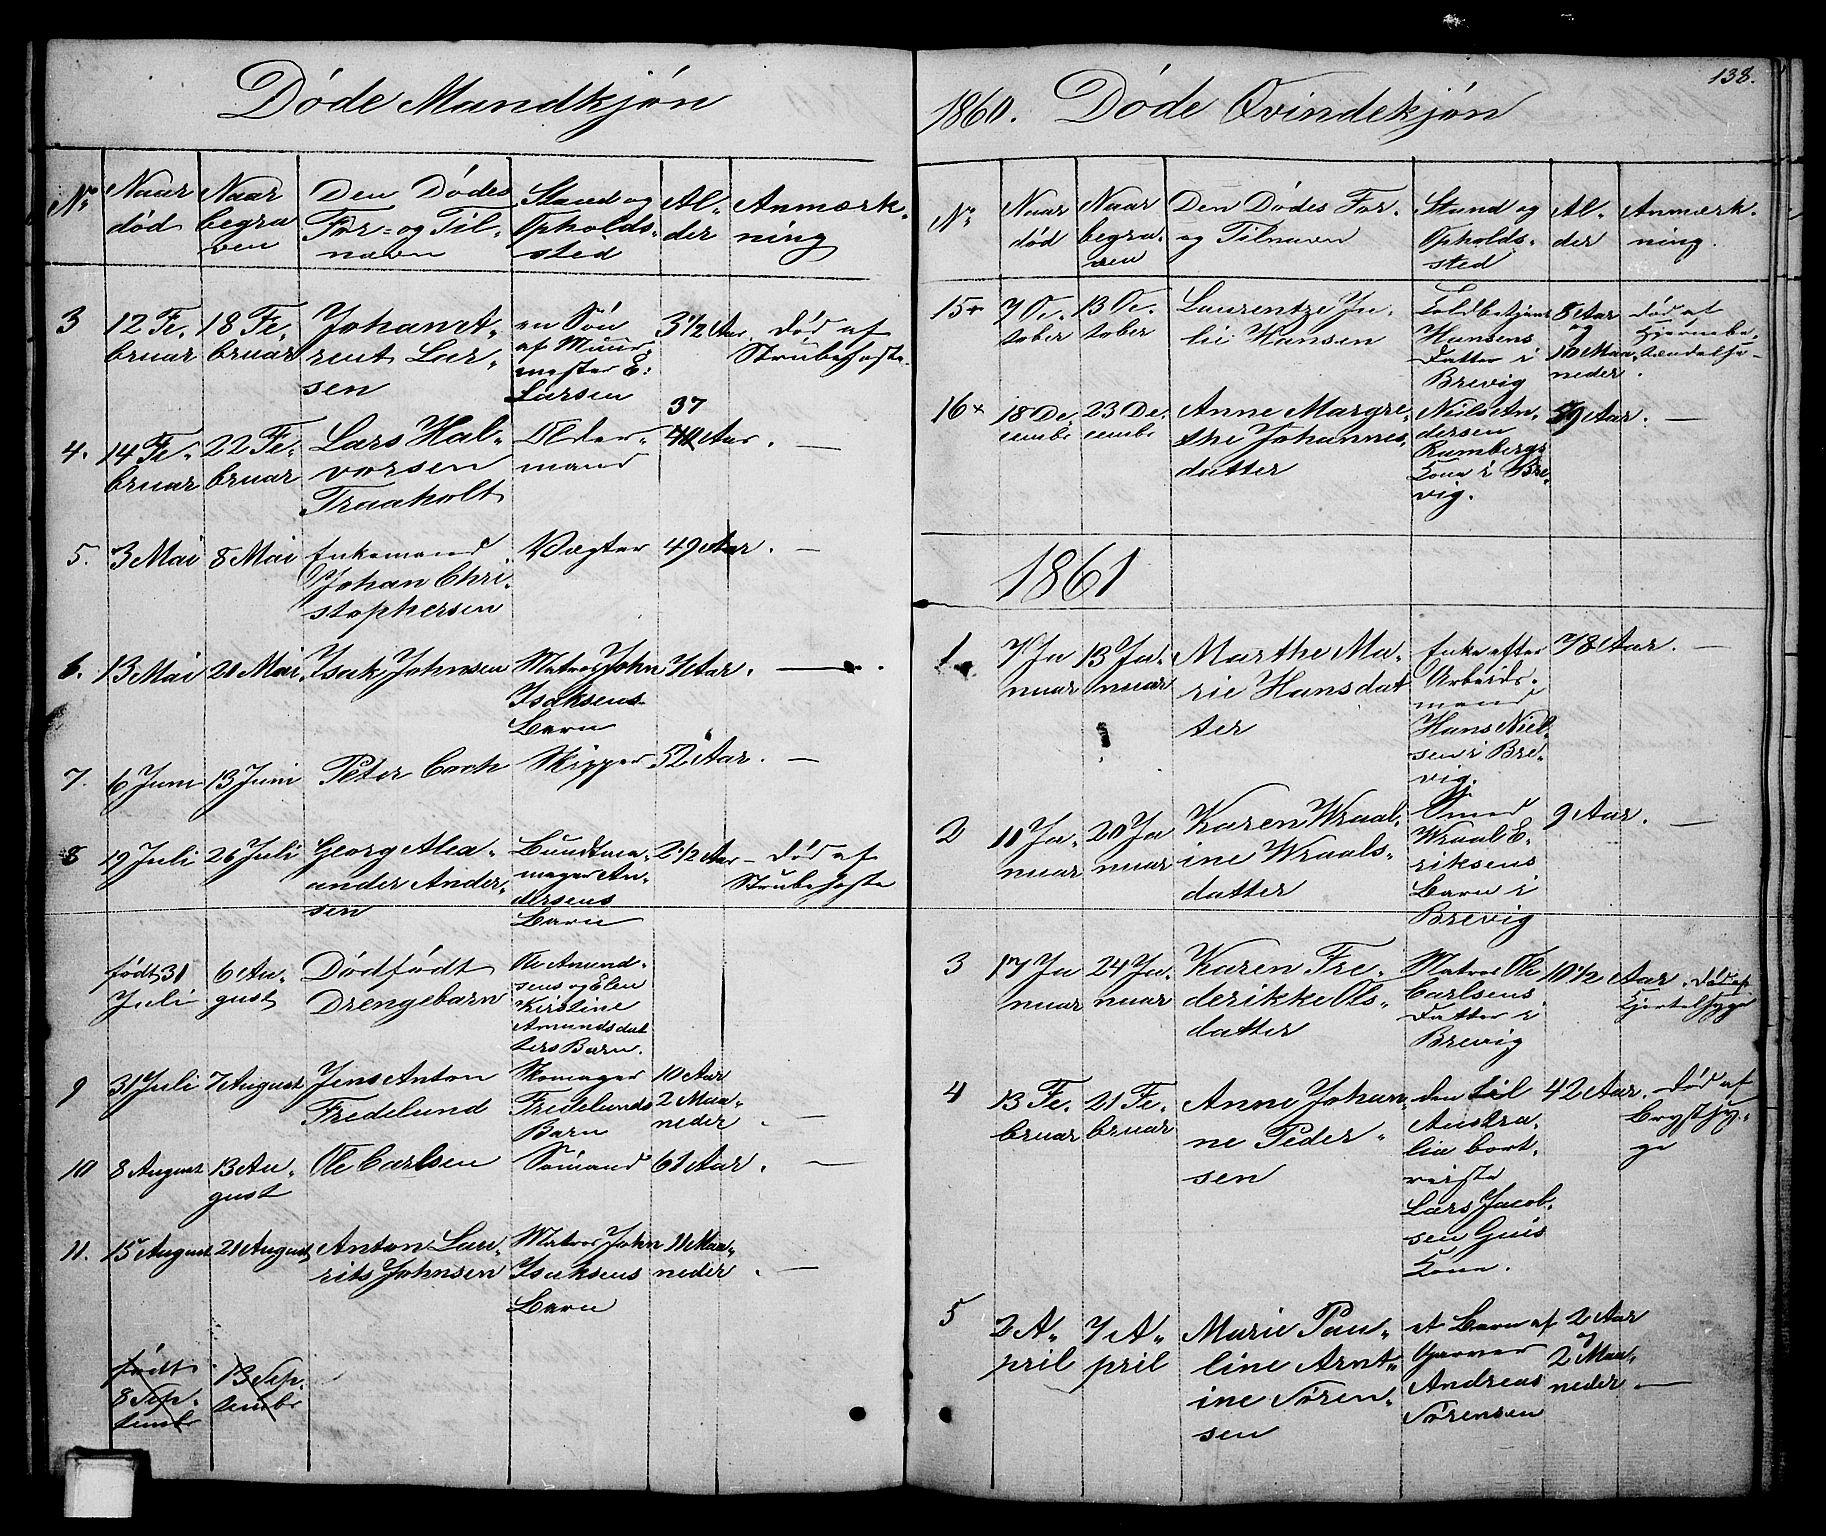 SAKO, Brevik kirkebøker, G/Ga/L0002: Klokkerbok nr. 2, 1846-1865, s. 138